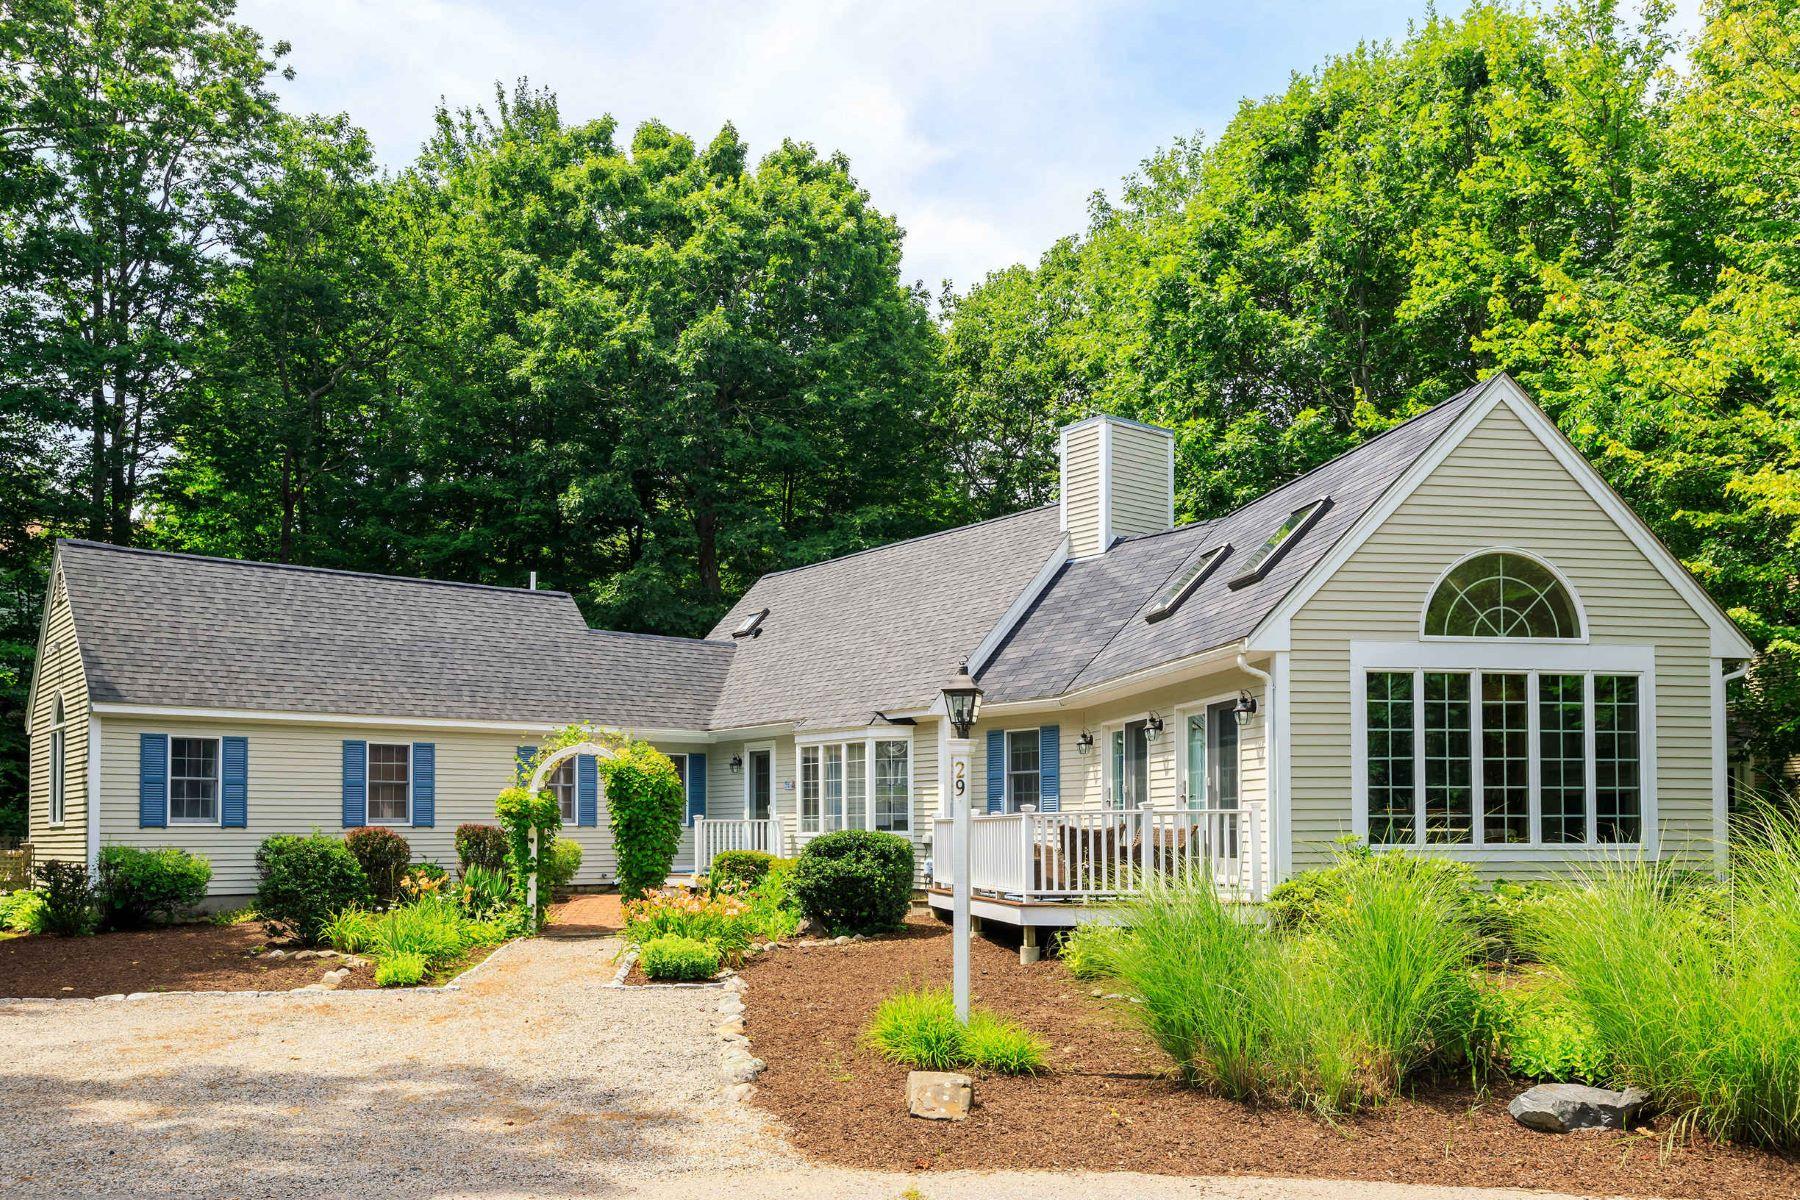 Single Family Homes for Sale at Contemporary by Ogunquit Center 29 Abenaki Lane Ogunquit, Maine 03907 United States